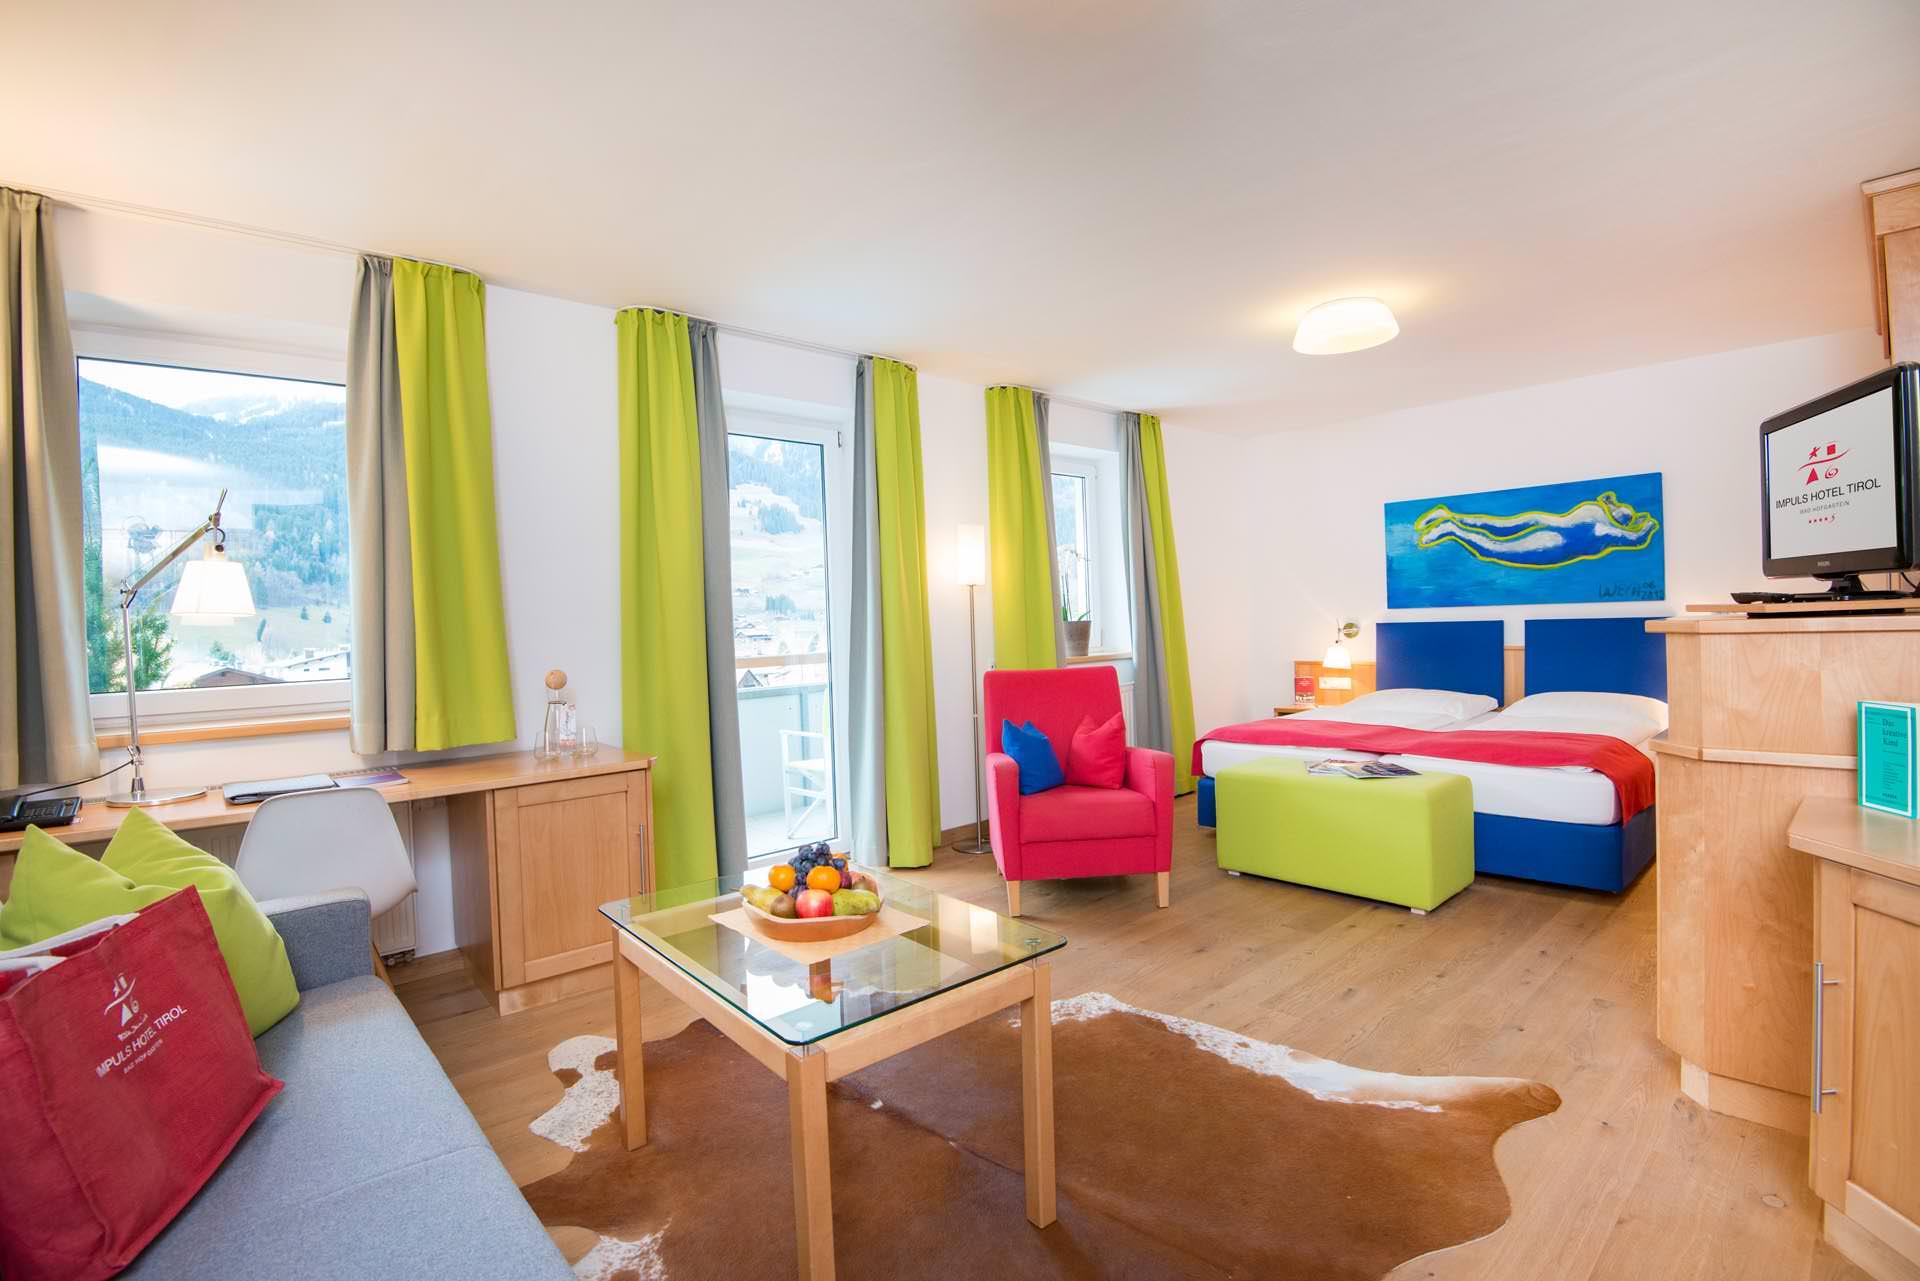 health spa resort impuls hotel tirol near salzburg. Black Bedroom Furniture Sets. Home Design Ideas